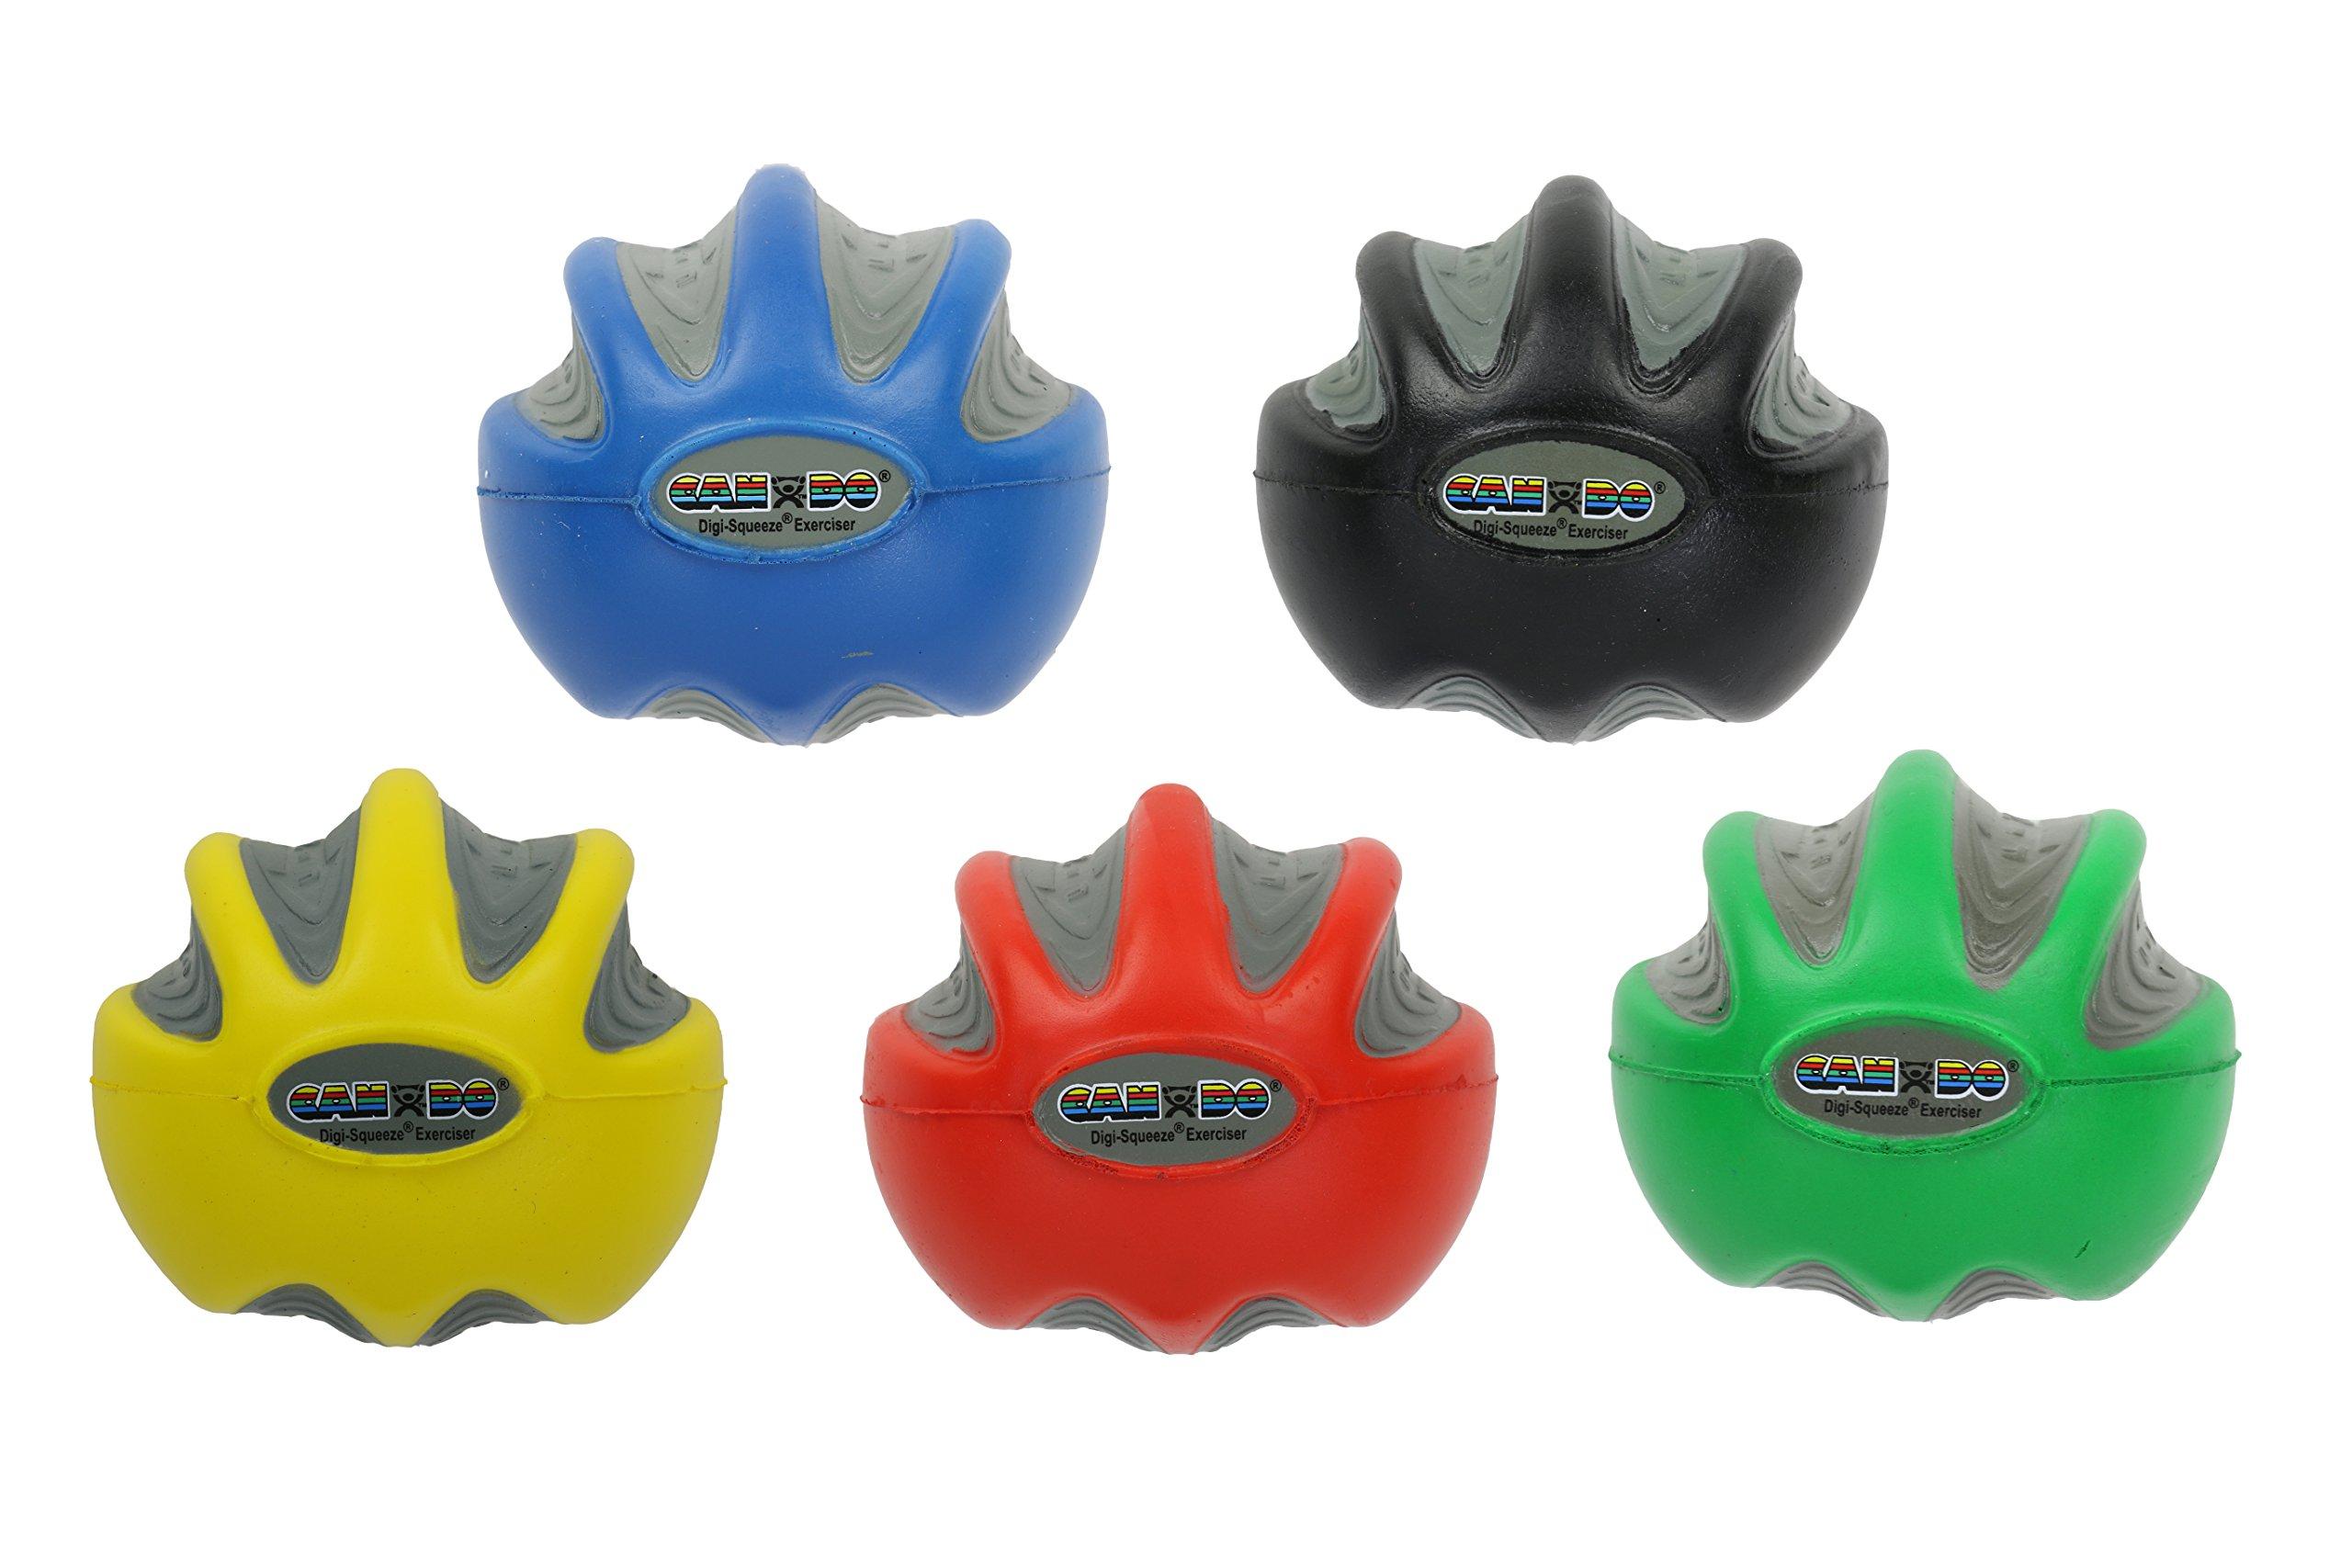 CanDo Digi-Squeeze Hand Exerciser